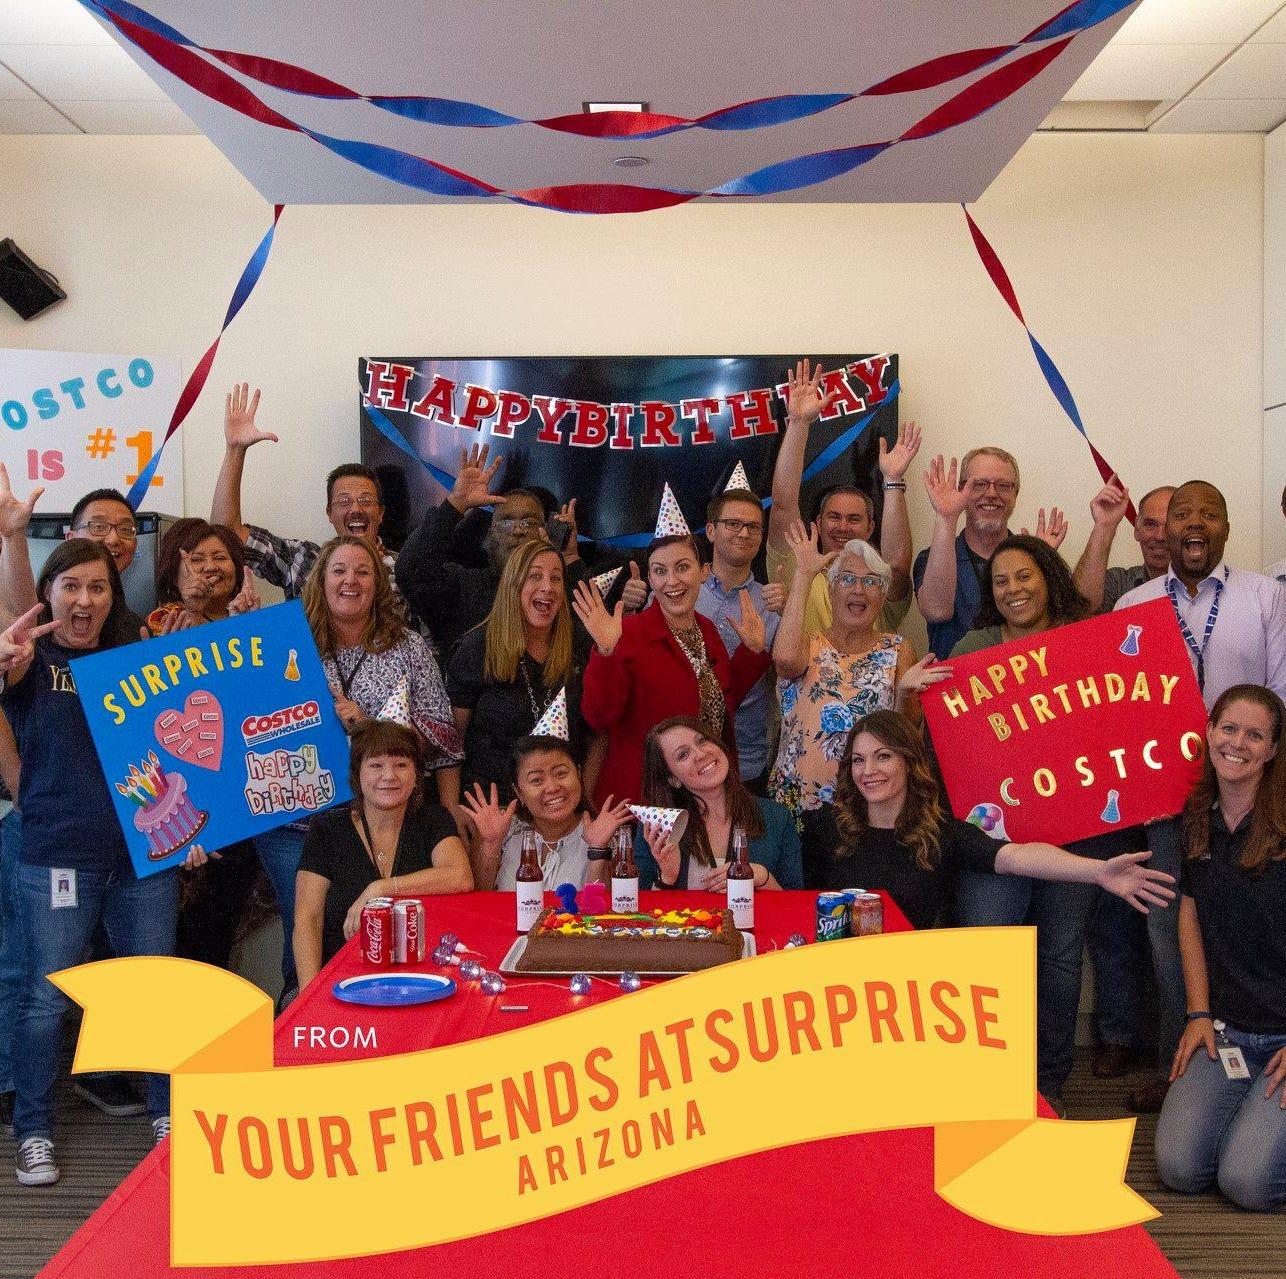 An Arizona city wants a Costco so bad that it threw the company a birthday party